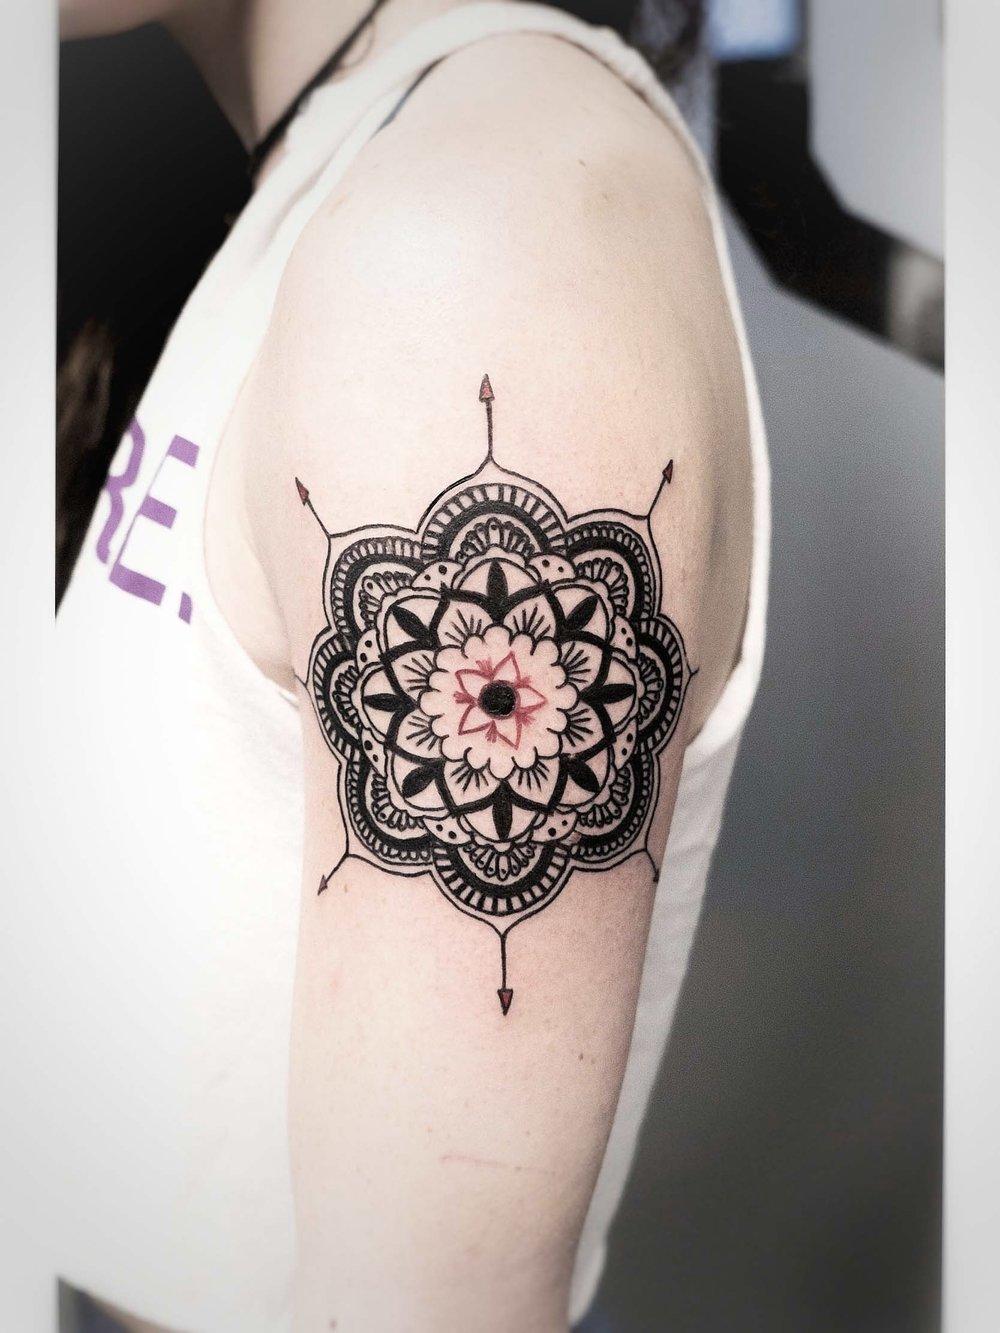 Custom Black Mandala with Red Arrow Accents Tattoo by Dani at Certified Tattoo Studios Denver Co.jpg